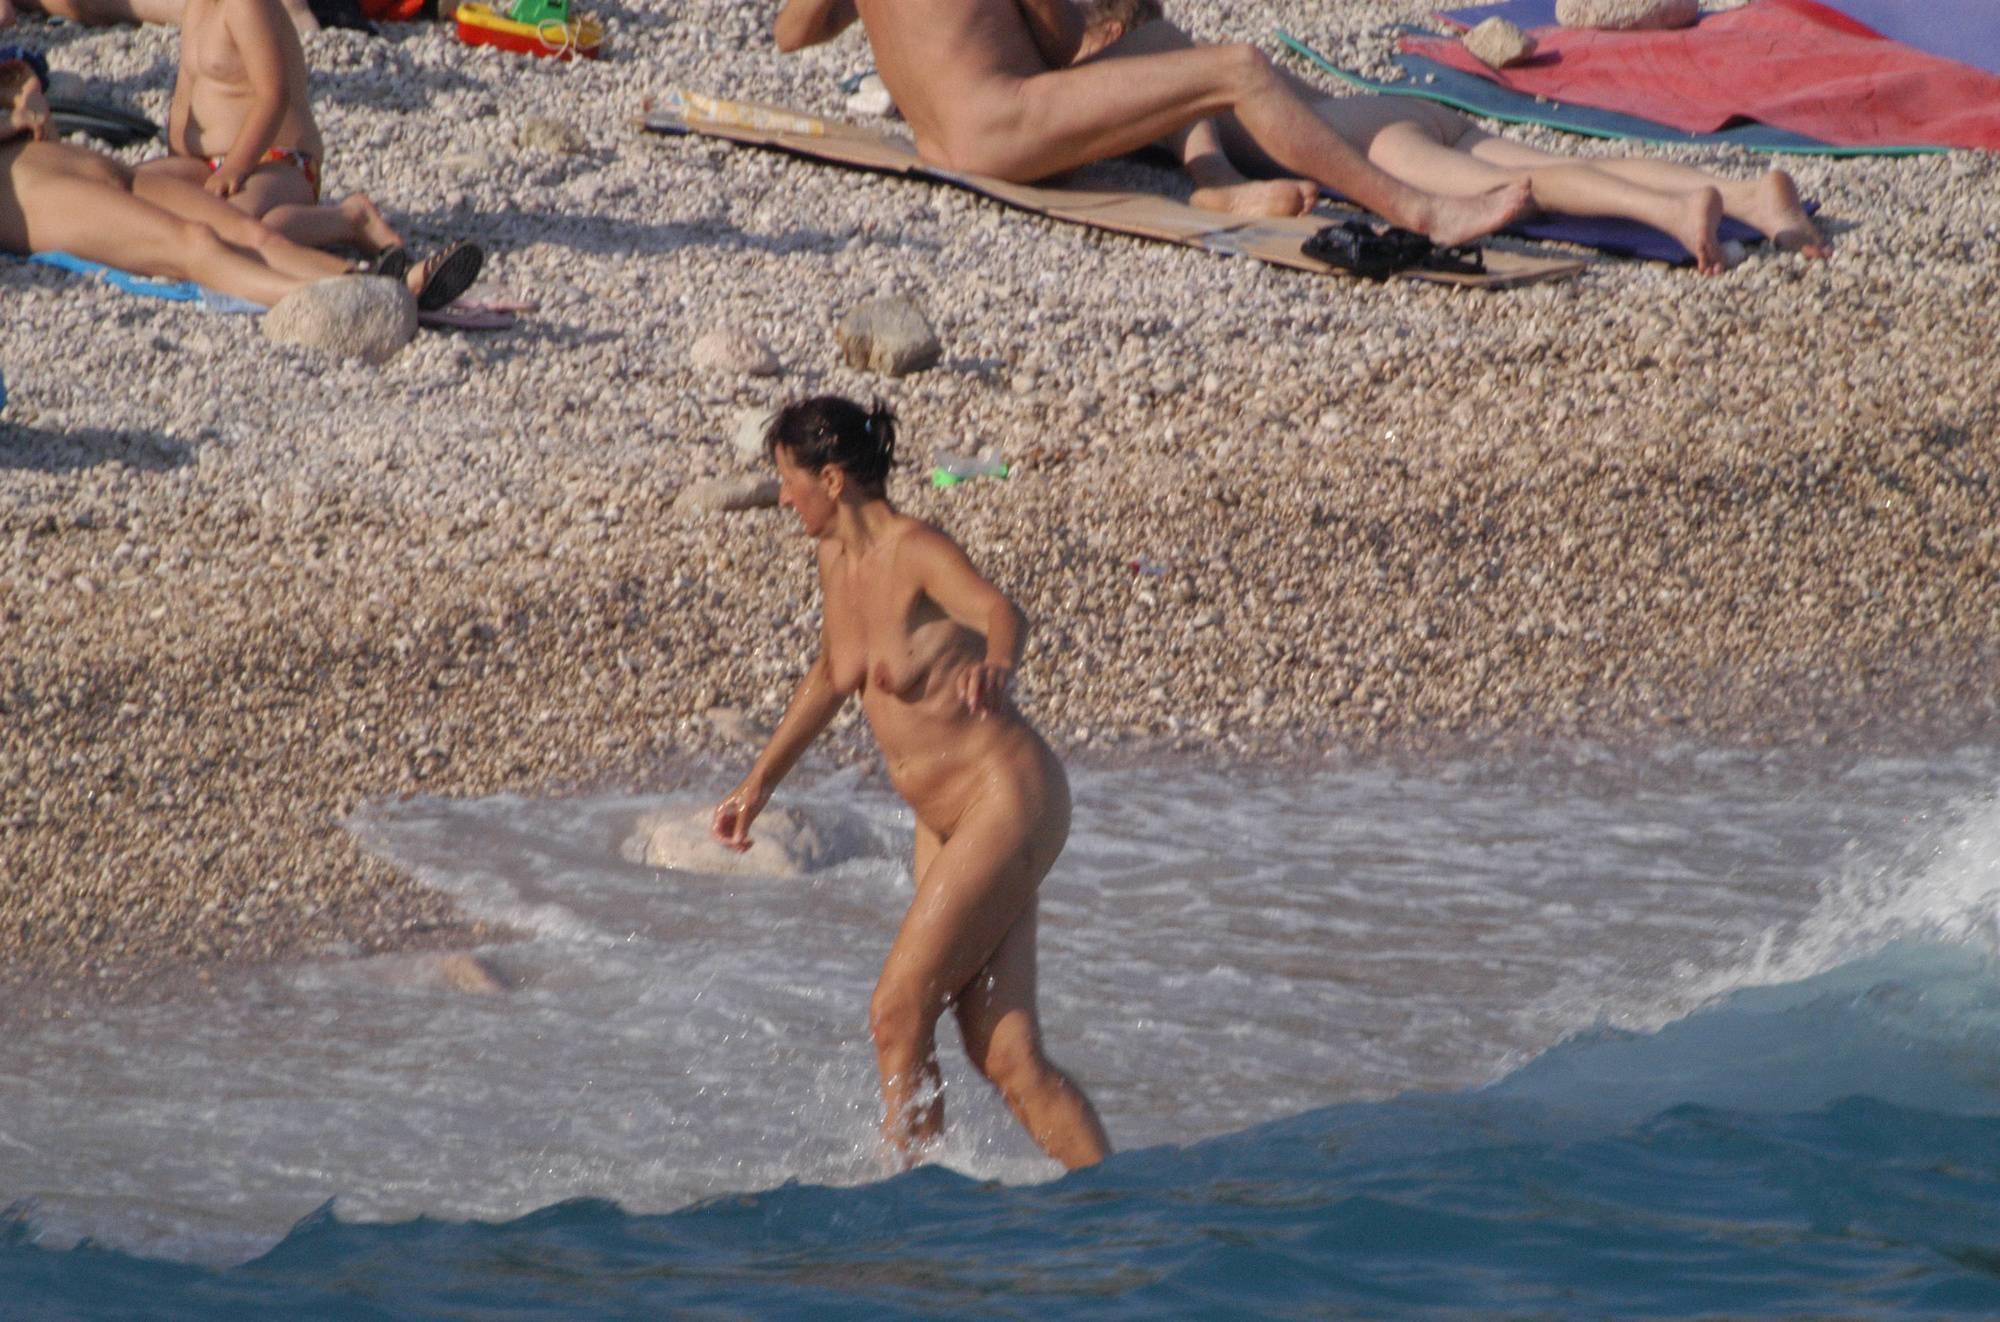 Nudist Pics Baska Rock-Wall Beach - 2